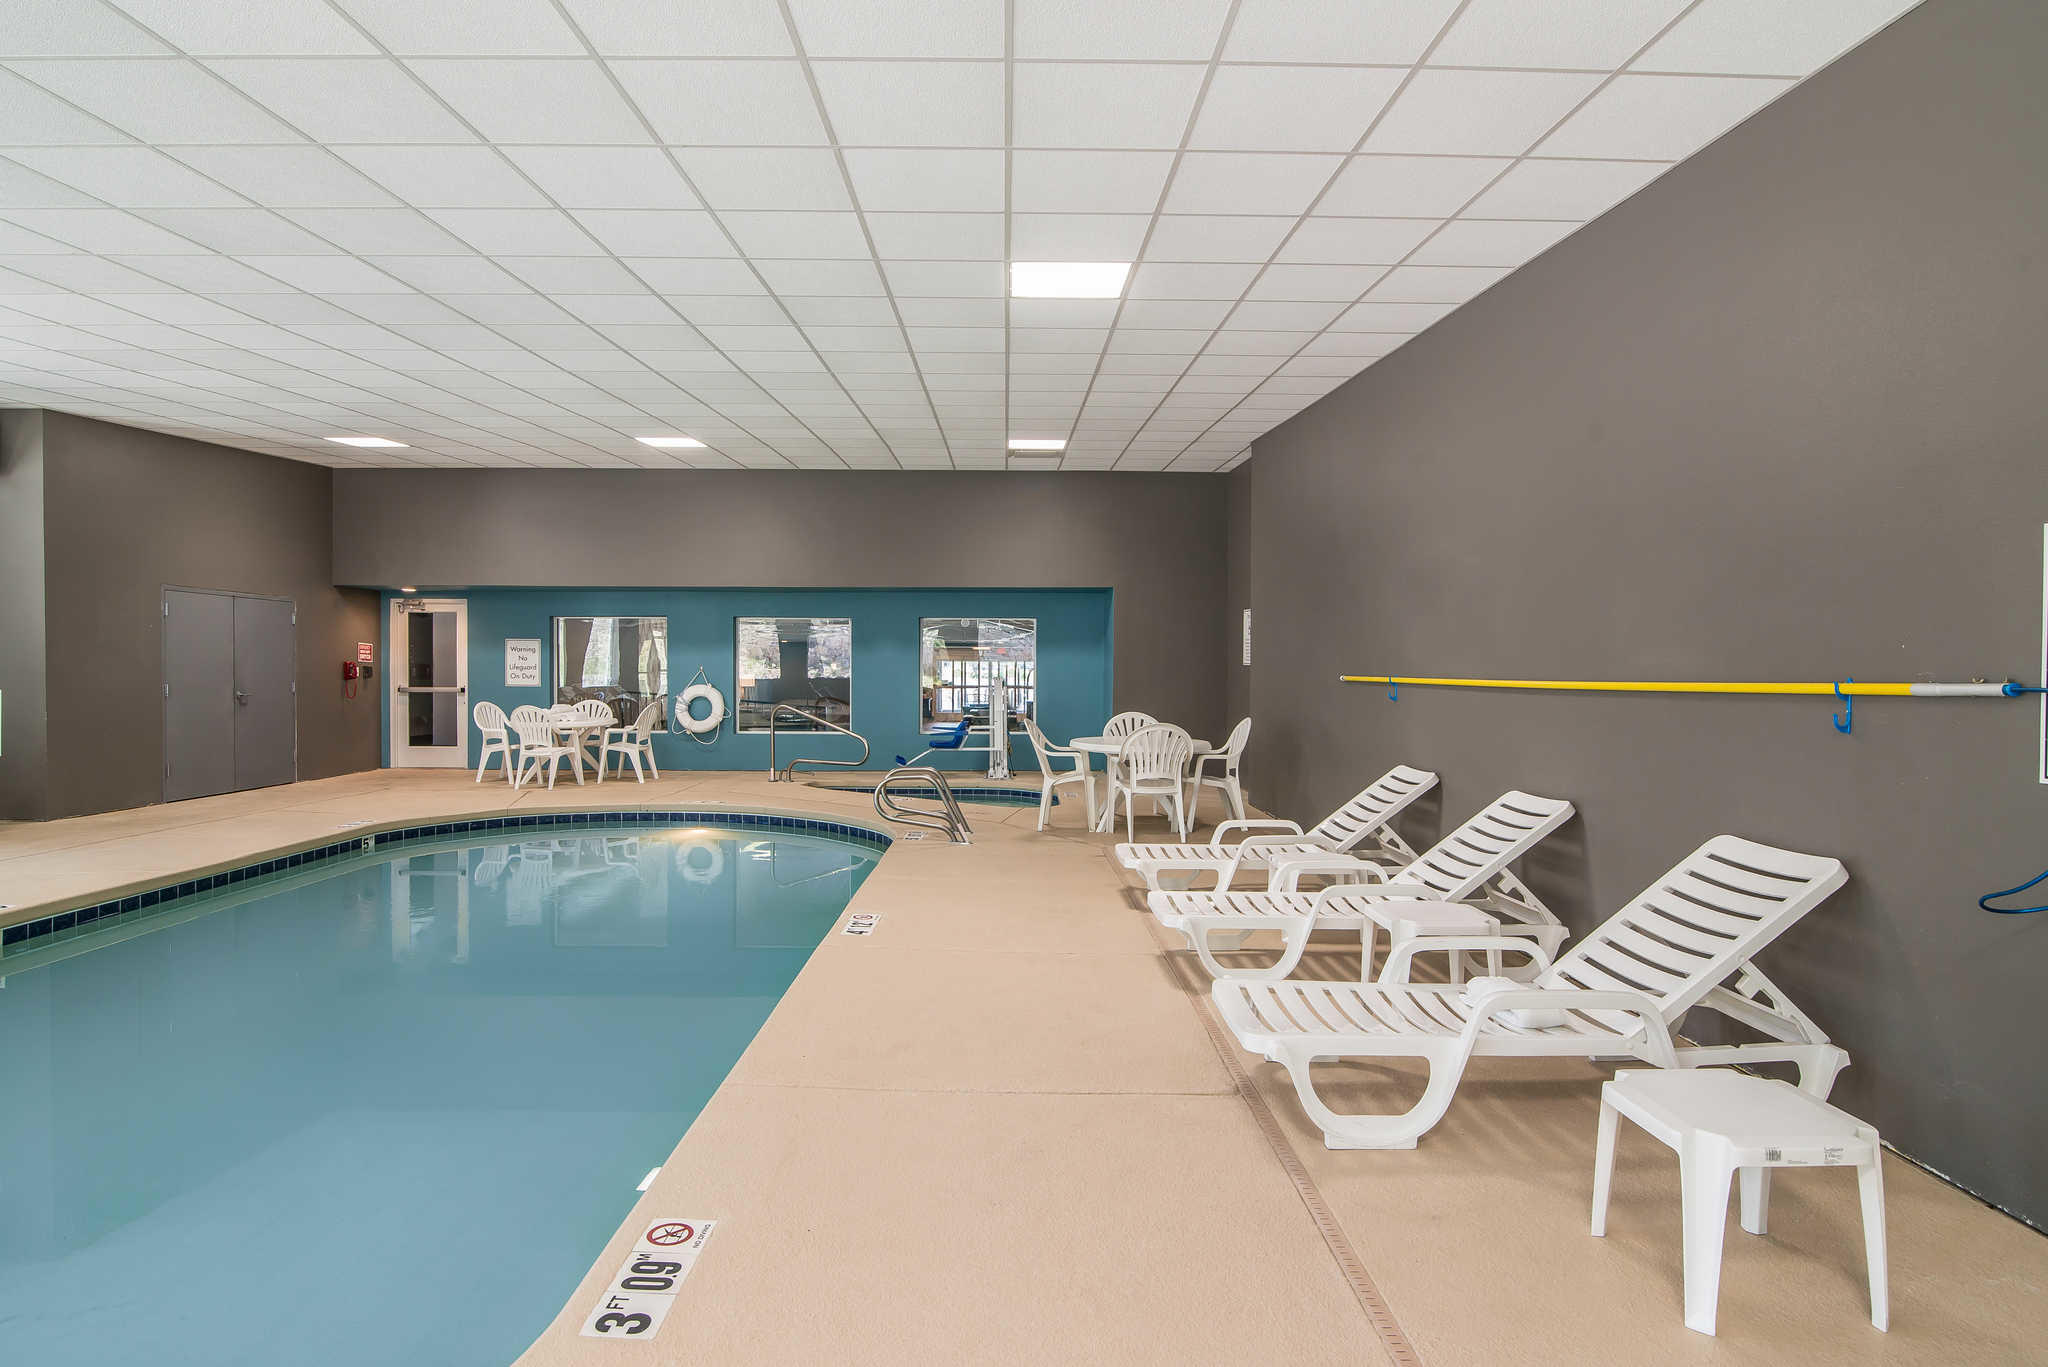 Quality Inn & Suites - Ruidoso Hwy 70 image 28